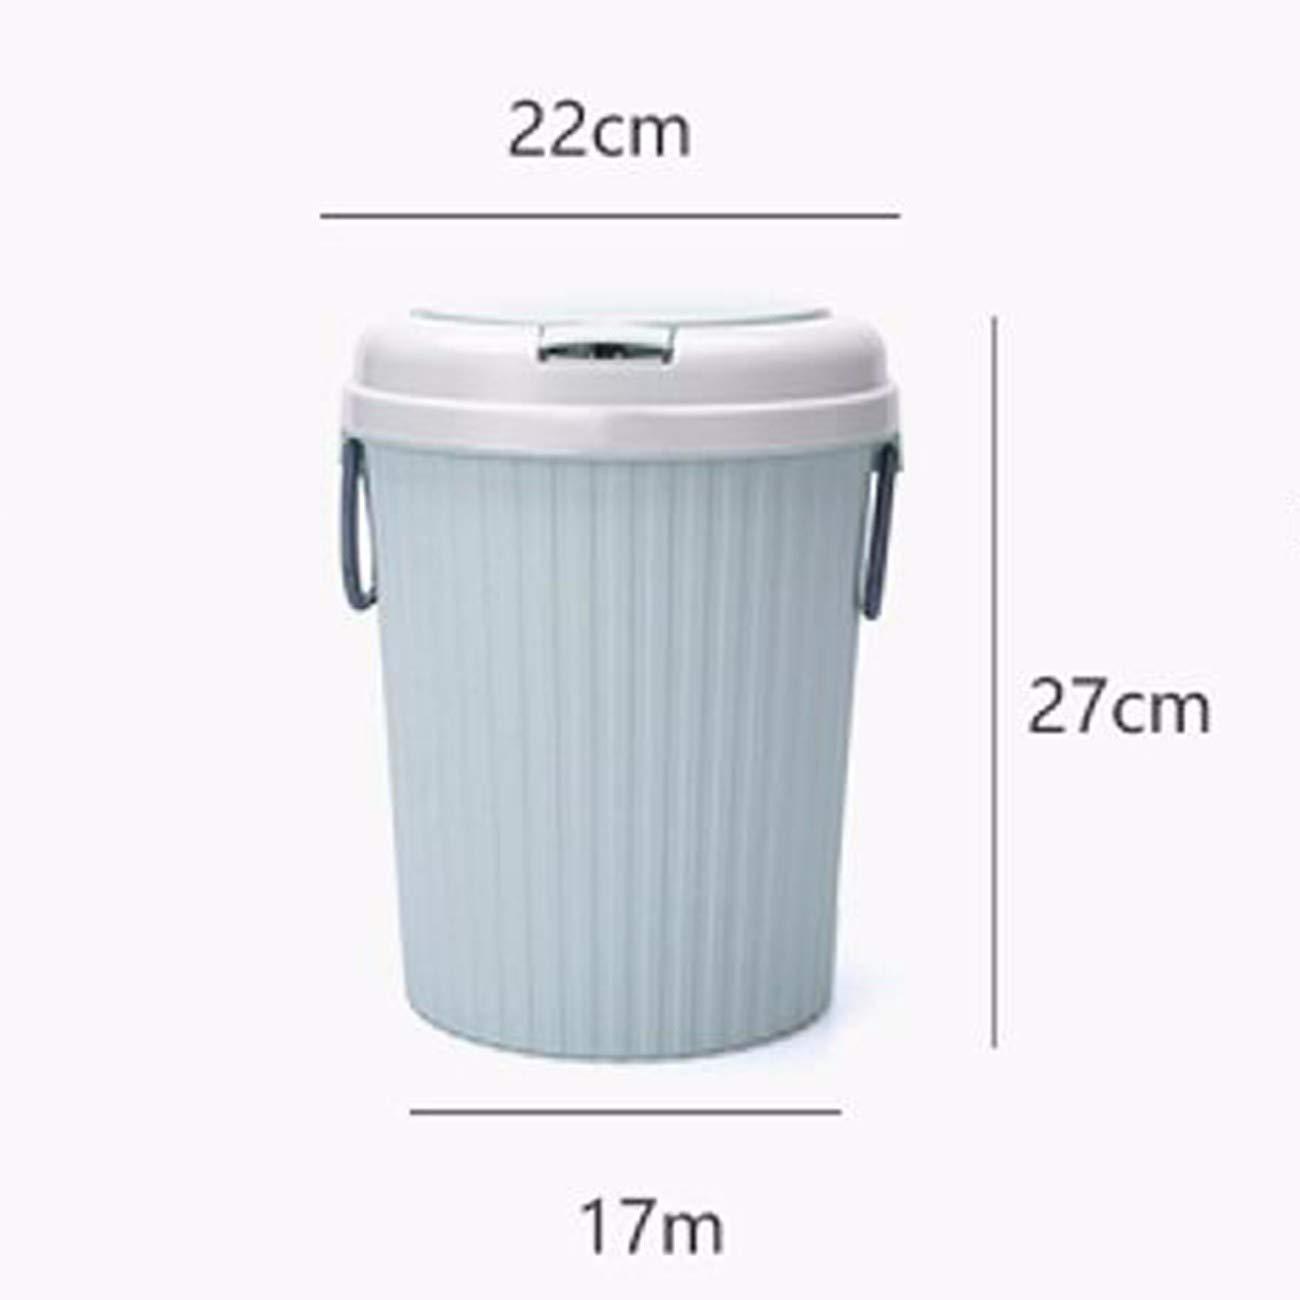 XJTNLB-cubos Large de basura Hogar Large XJTNLB-cubos Cap con Dustshell Cover,Un 15a629